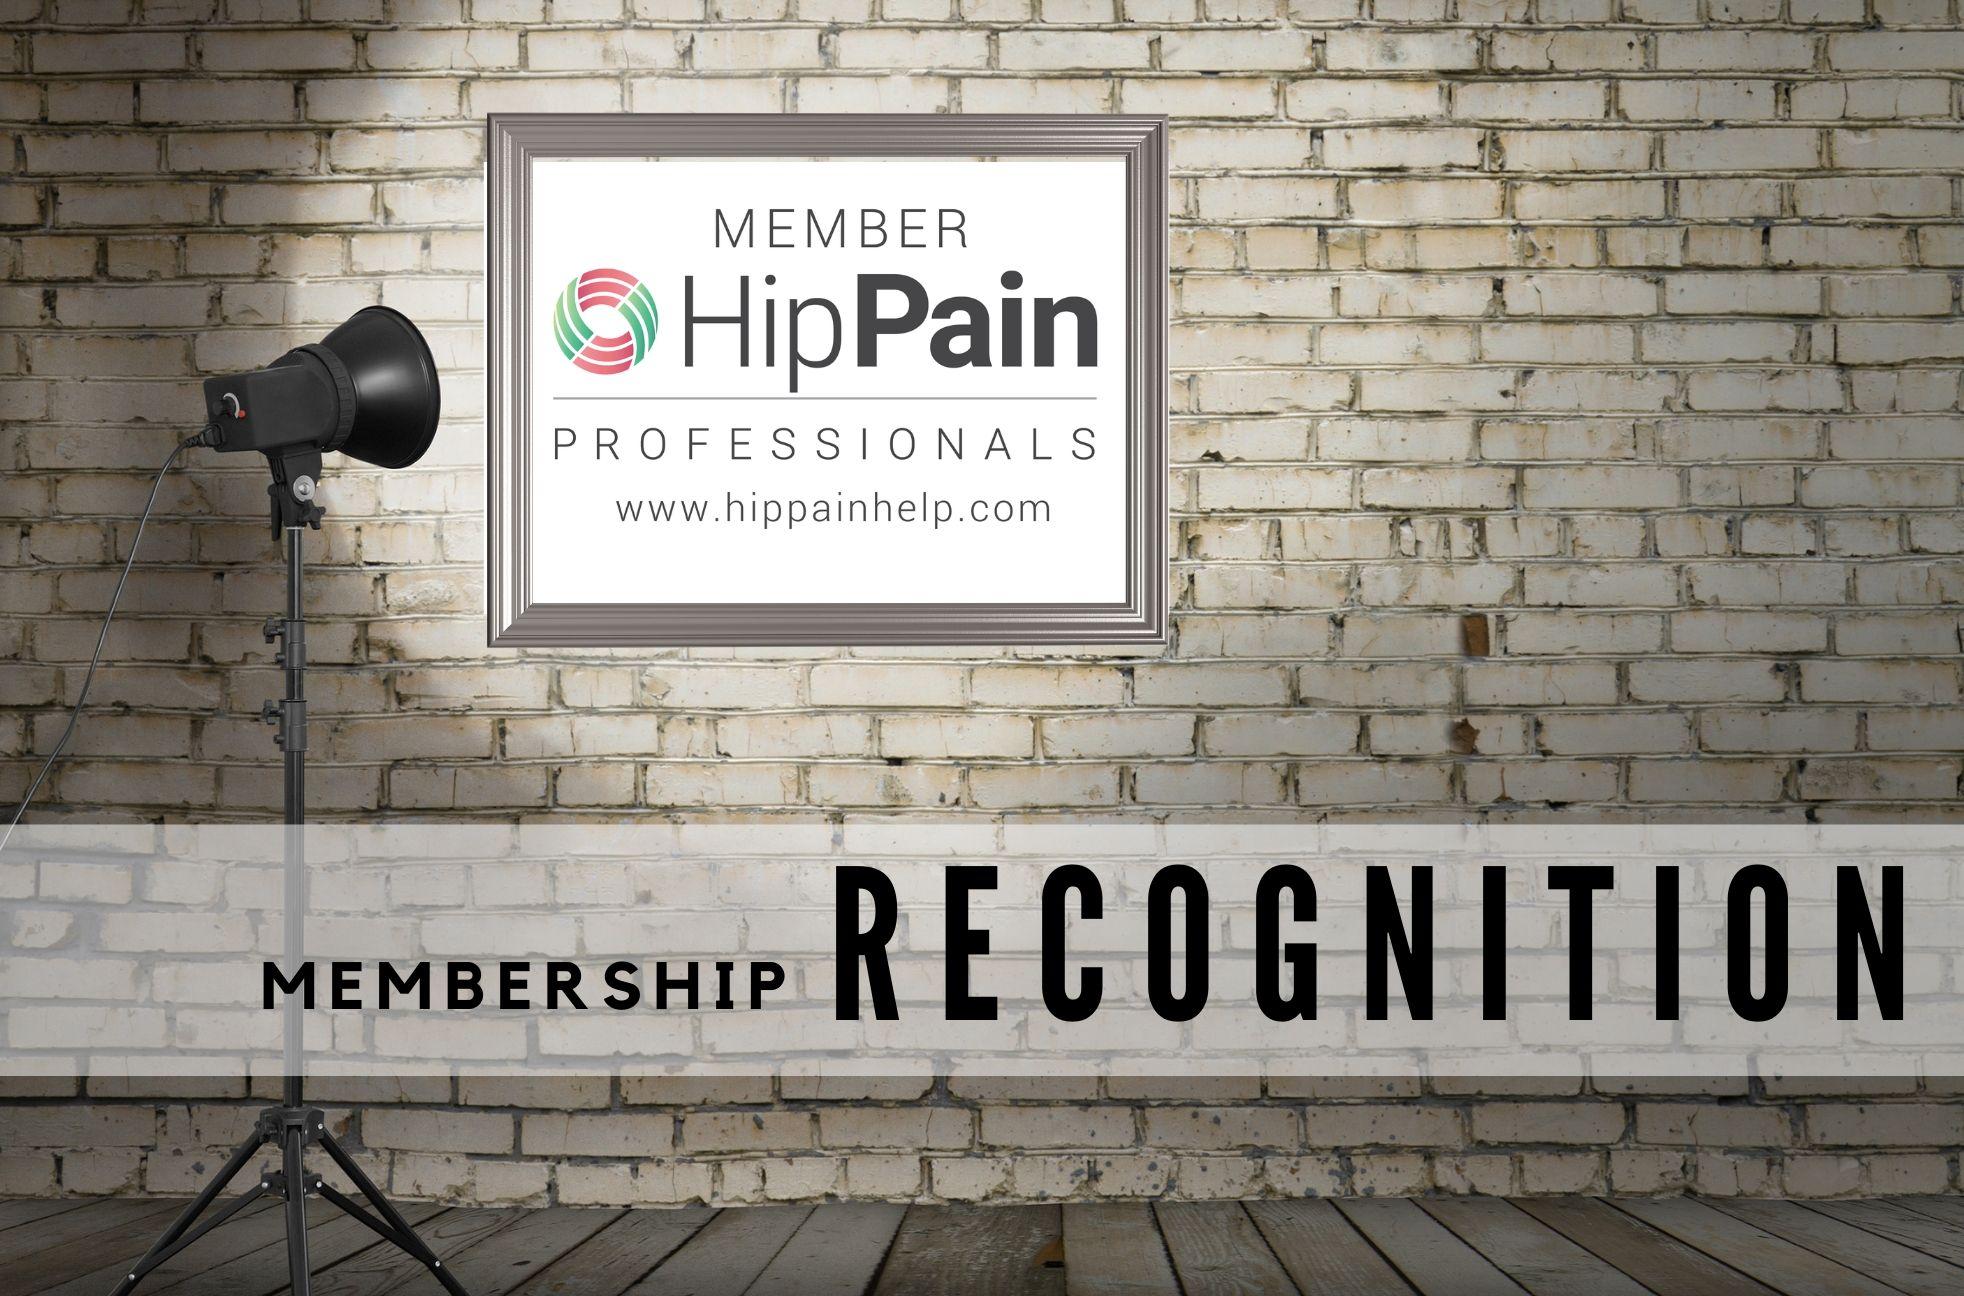 Membership Recognition